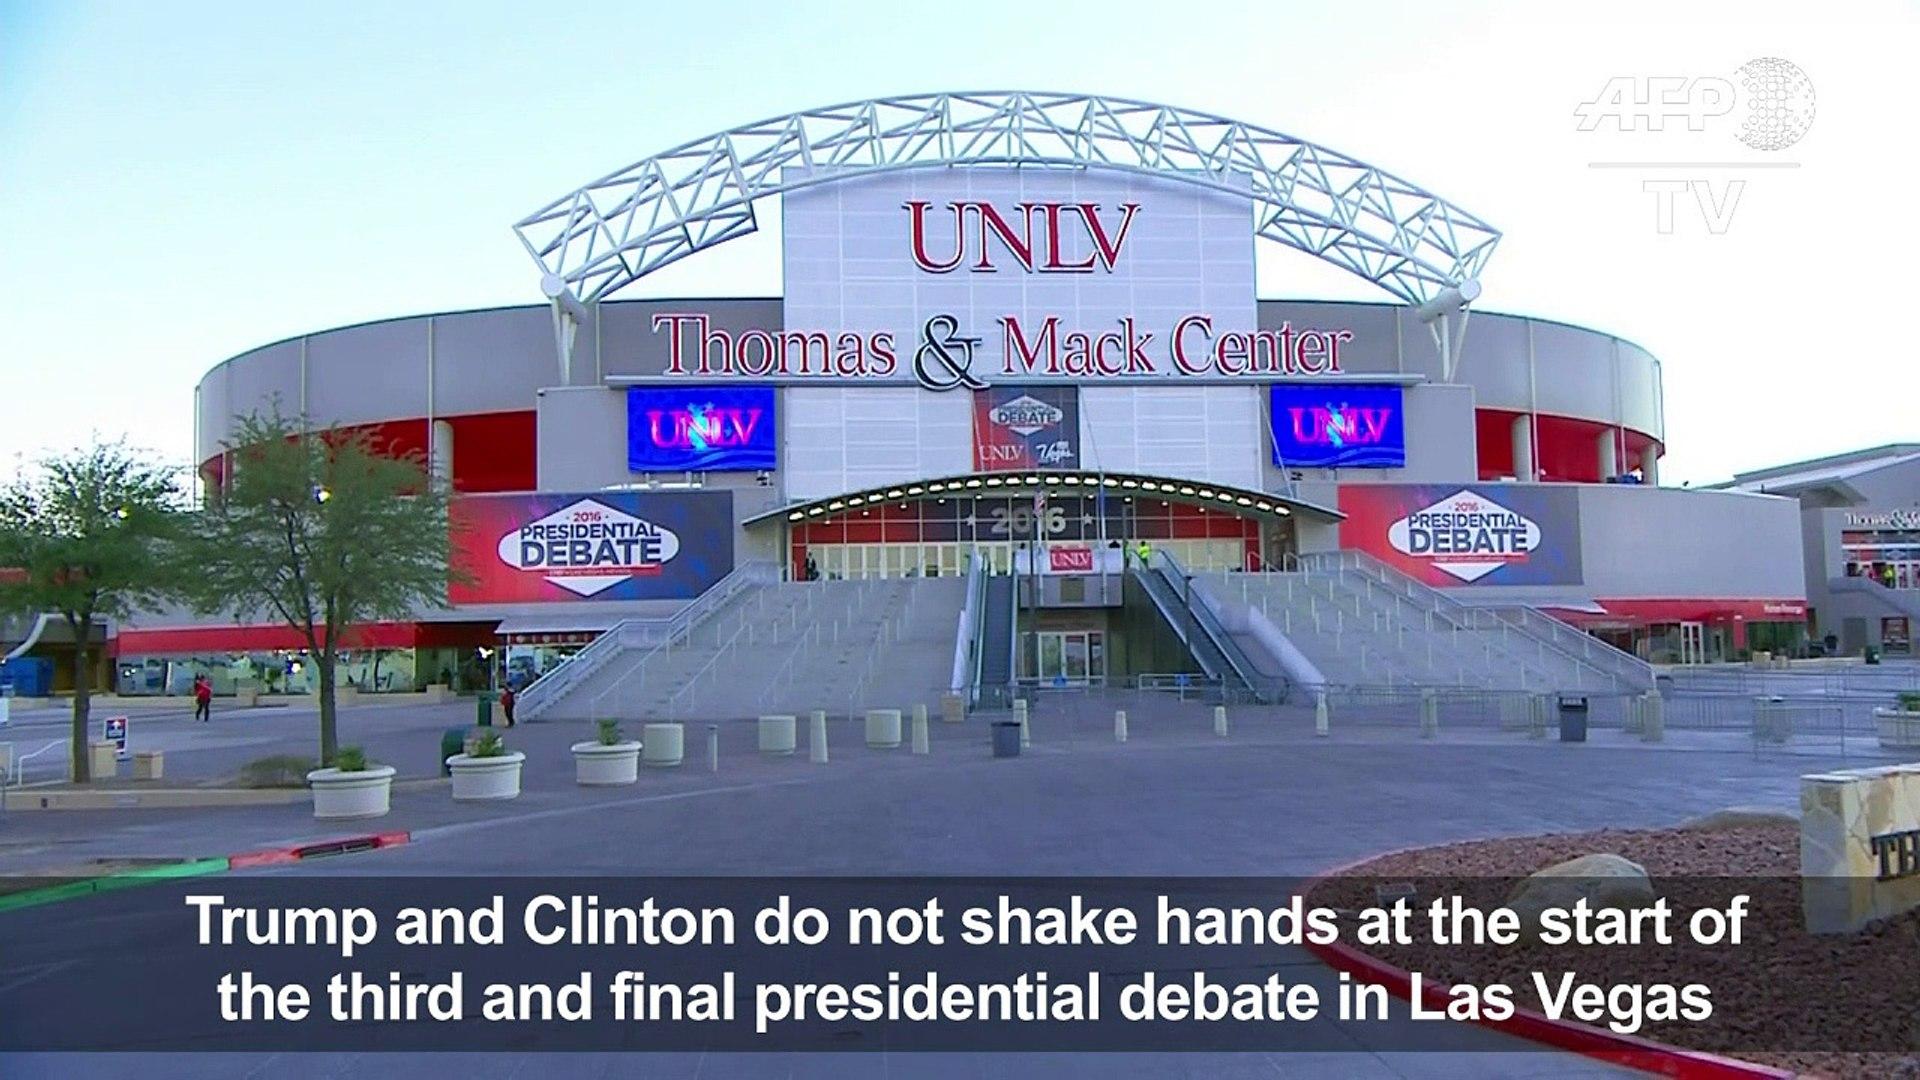 Clinton and Trump don't shake hands at start of third debate